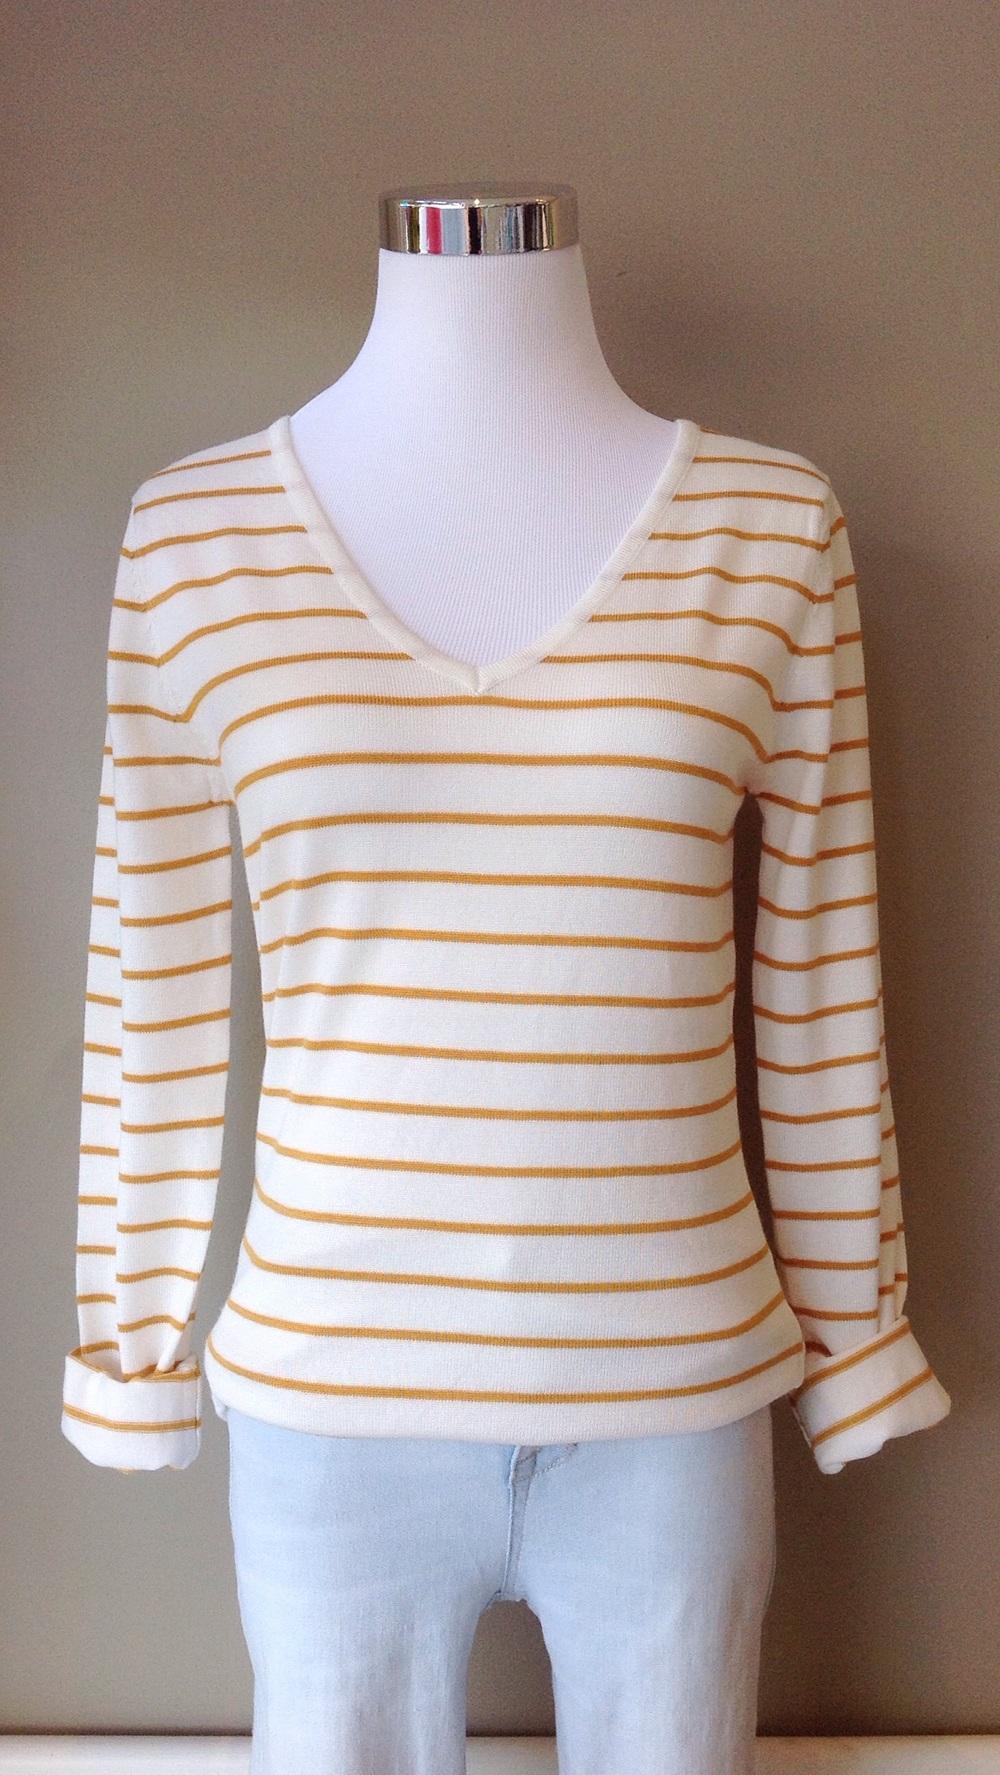 V neck stripe sweater in ivory/gold, $28